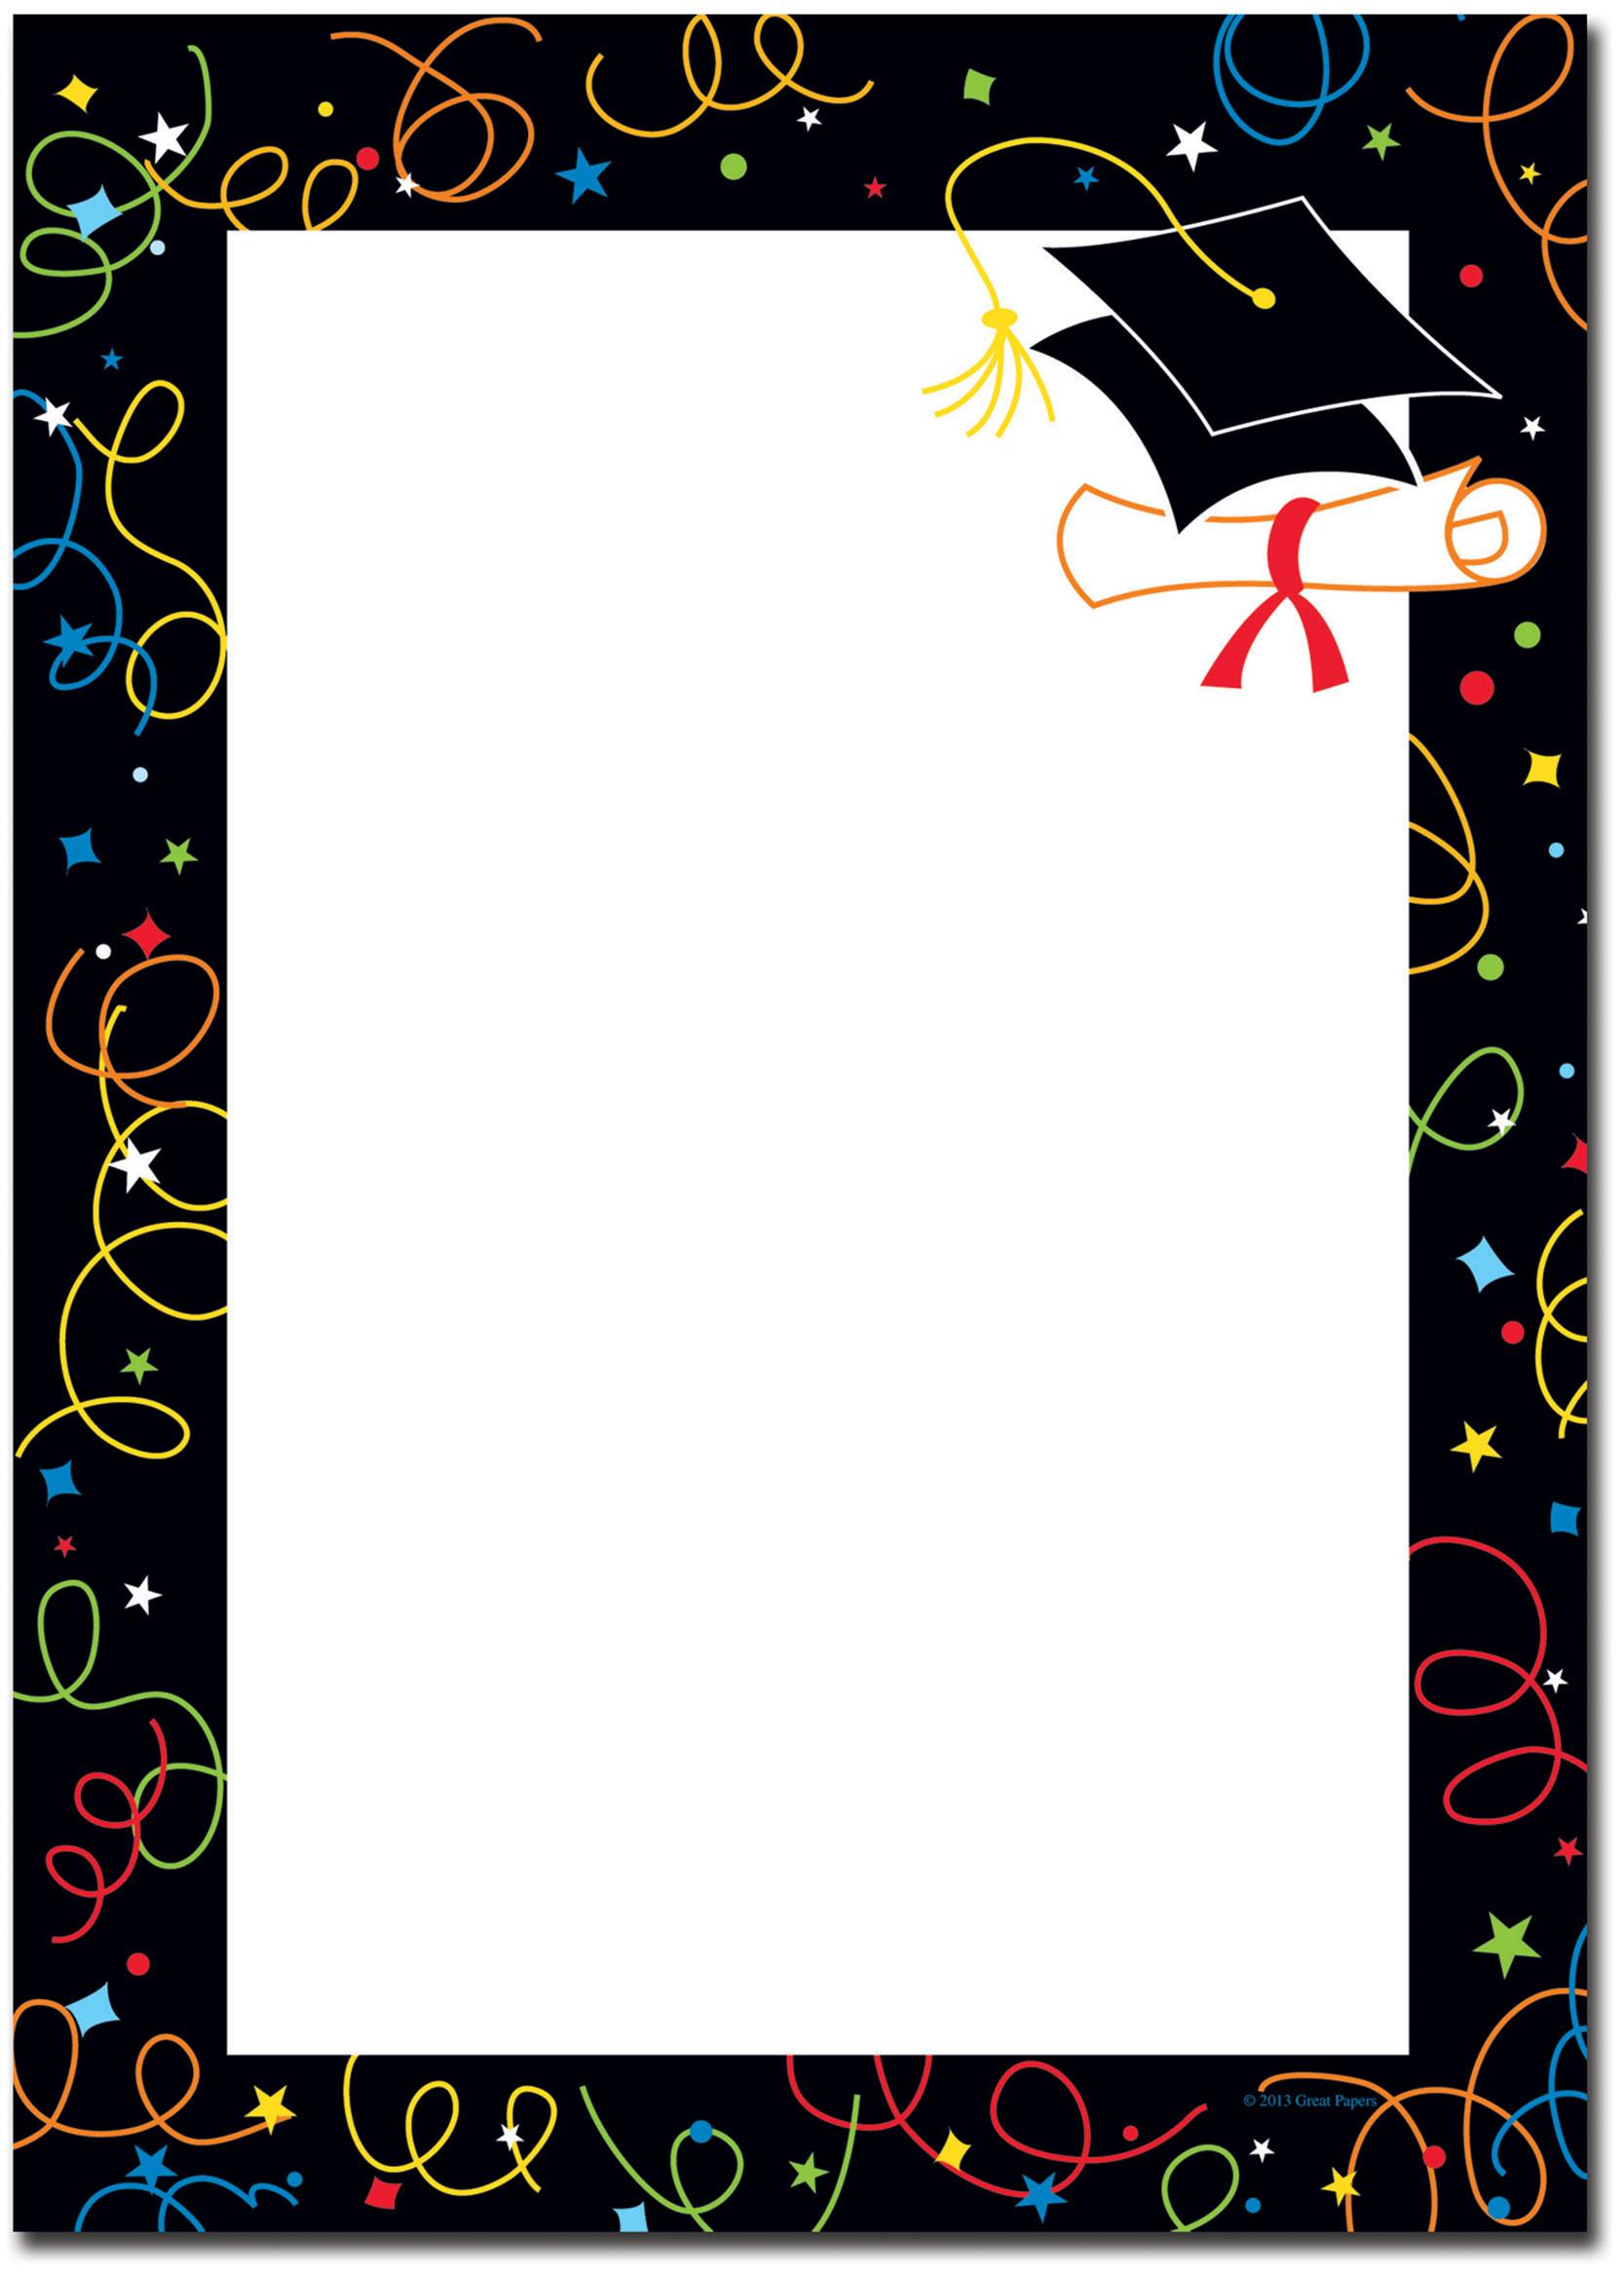 Free graduation border clipart vector black and white download Free Graduation Borders, Download Free Clip Art, Free Clip Art on ... vector black and white download